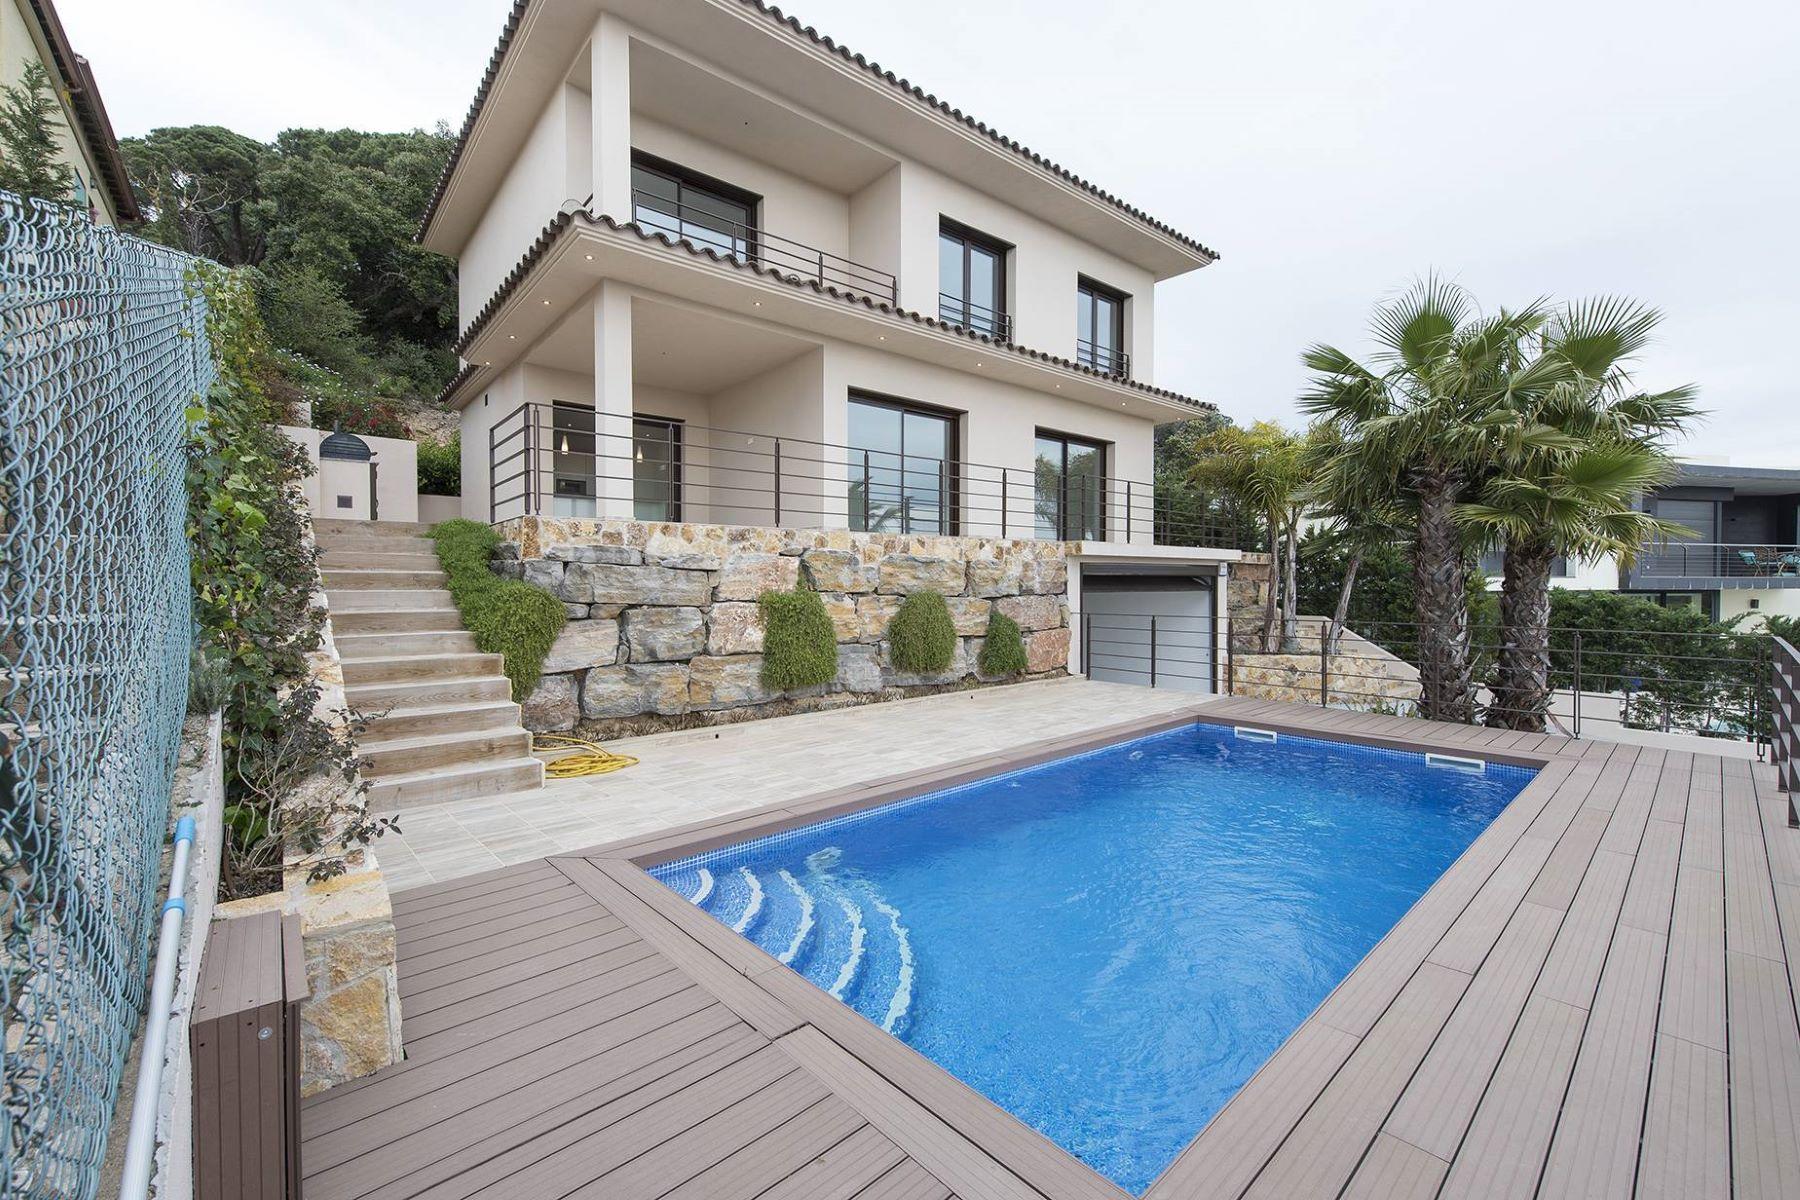 Single Family Home for Sale at Newly built villa with fantastic views to the Mediterranean Sea Lloret De Mar, Costa Brava, 17310 Spain